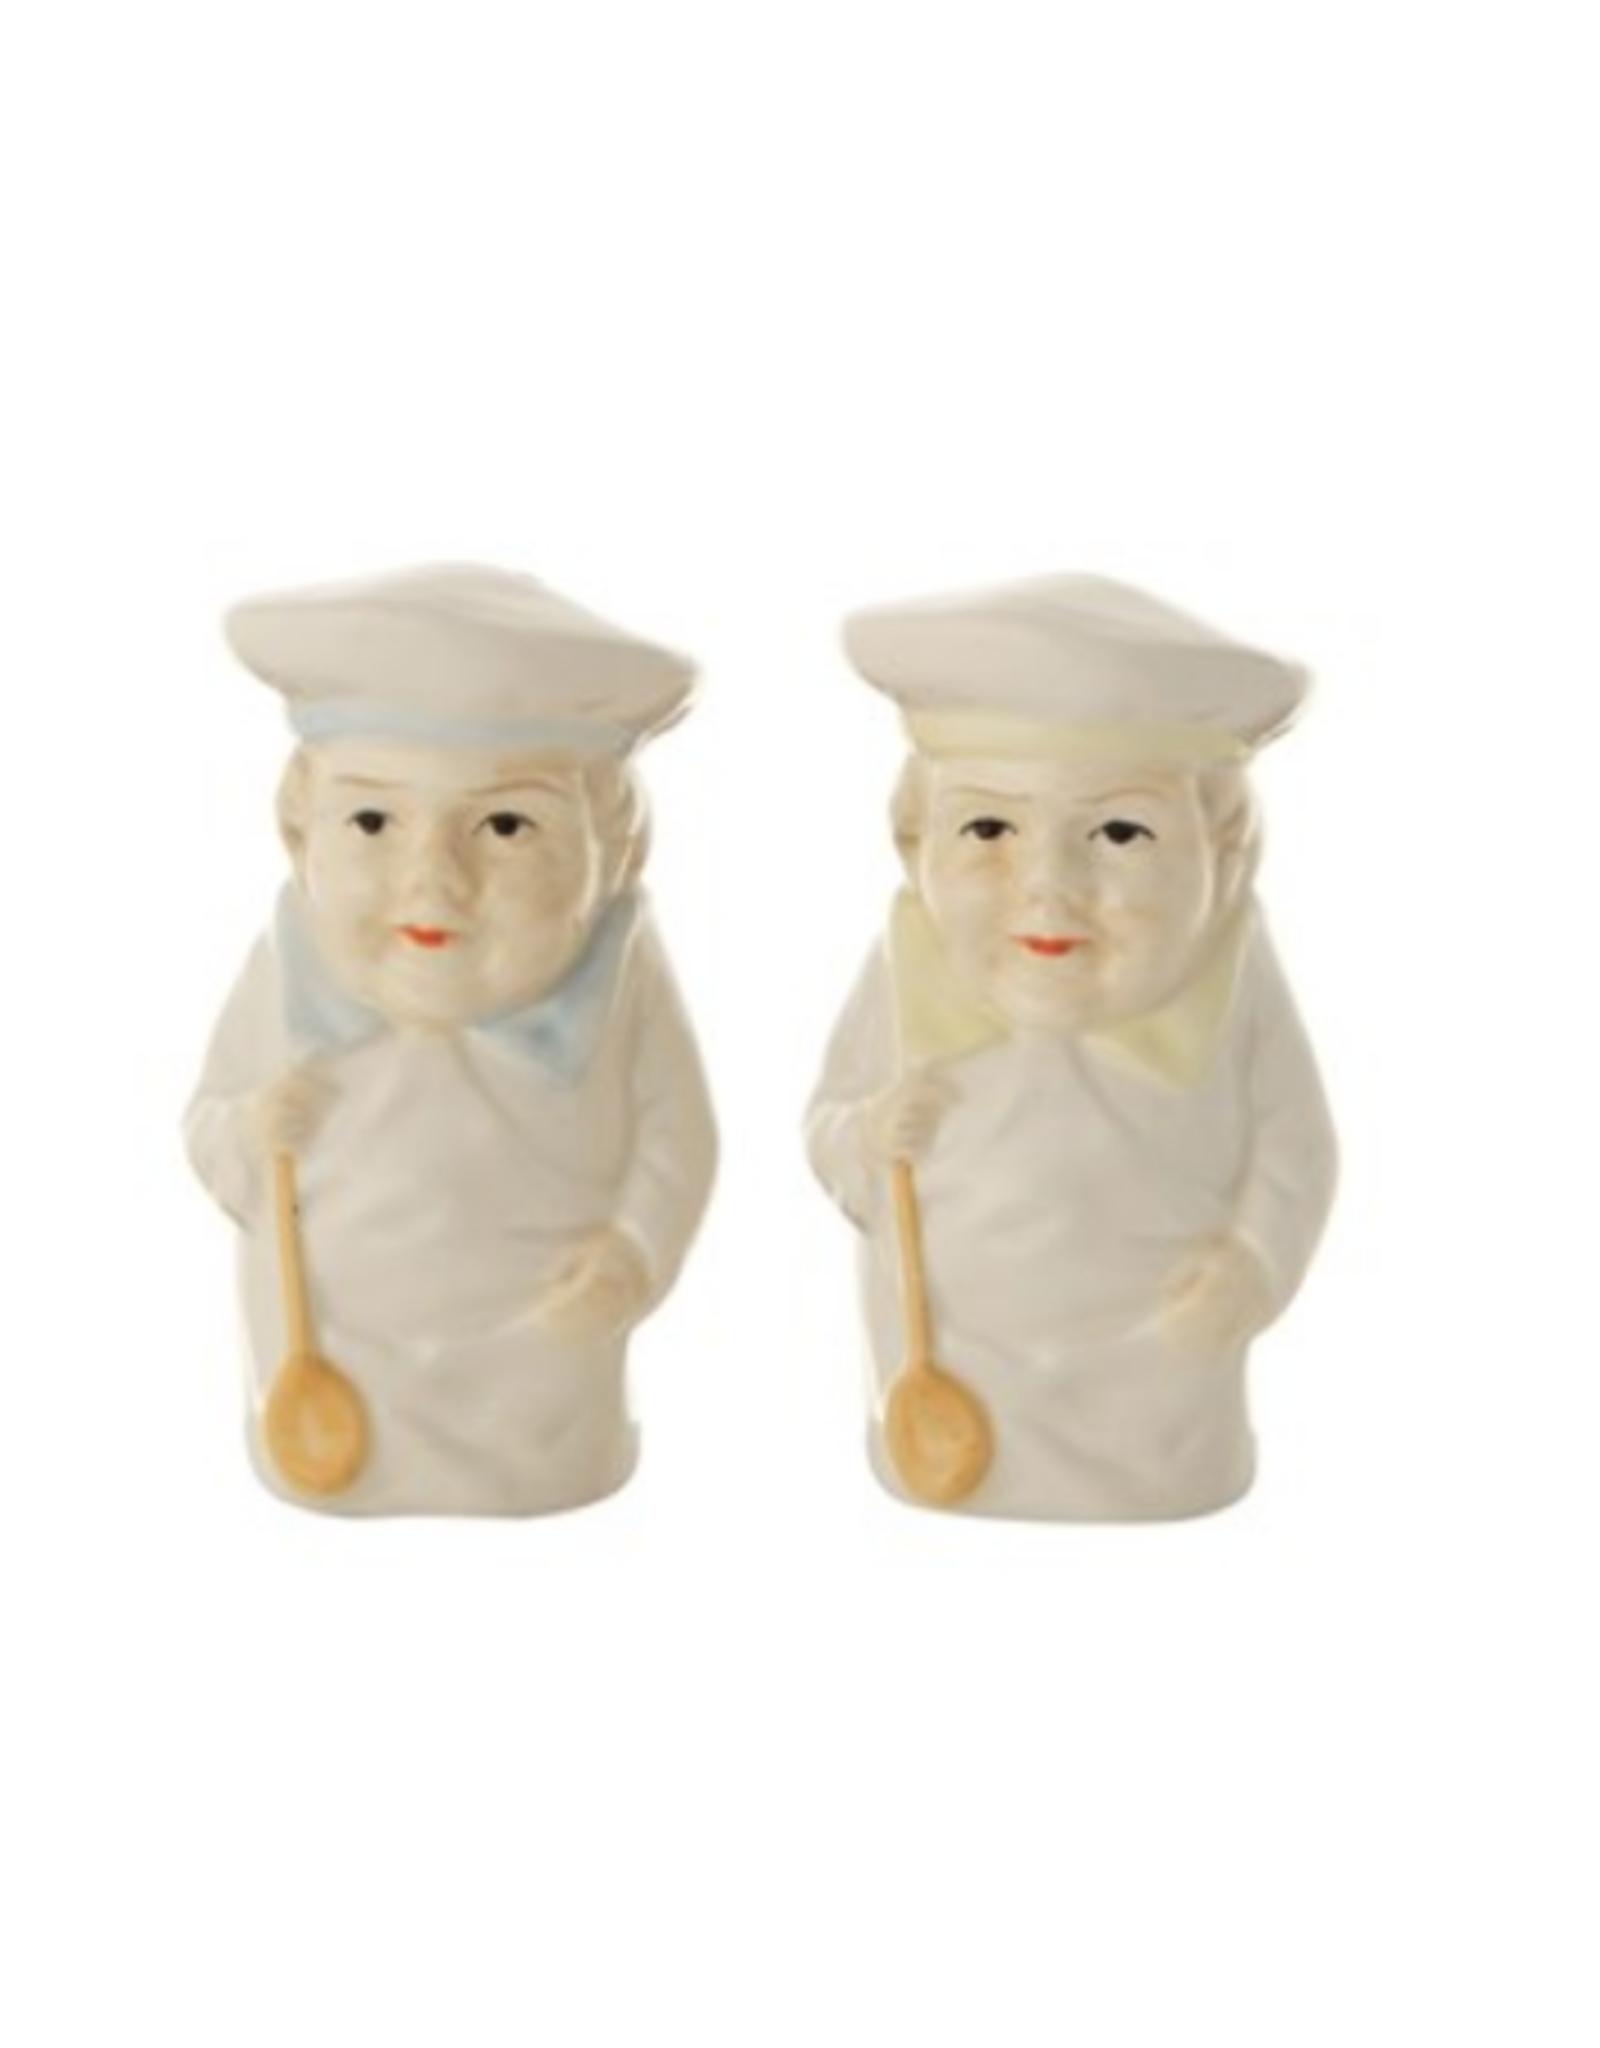 COP - Salt & Pepper Shakers/Chefs, Ceramic